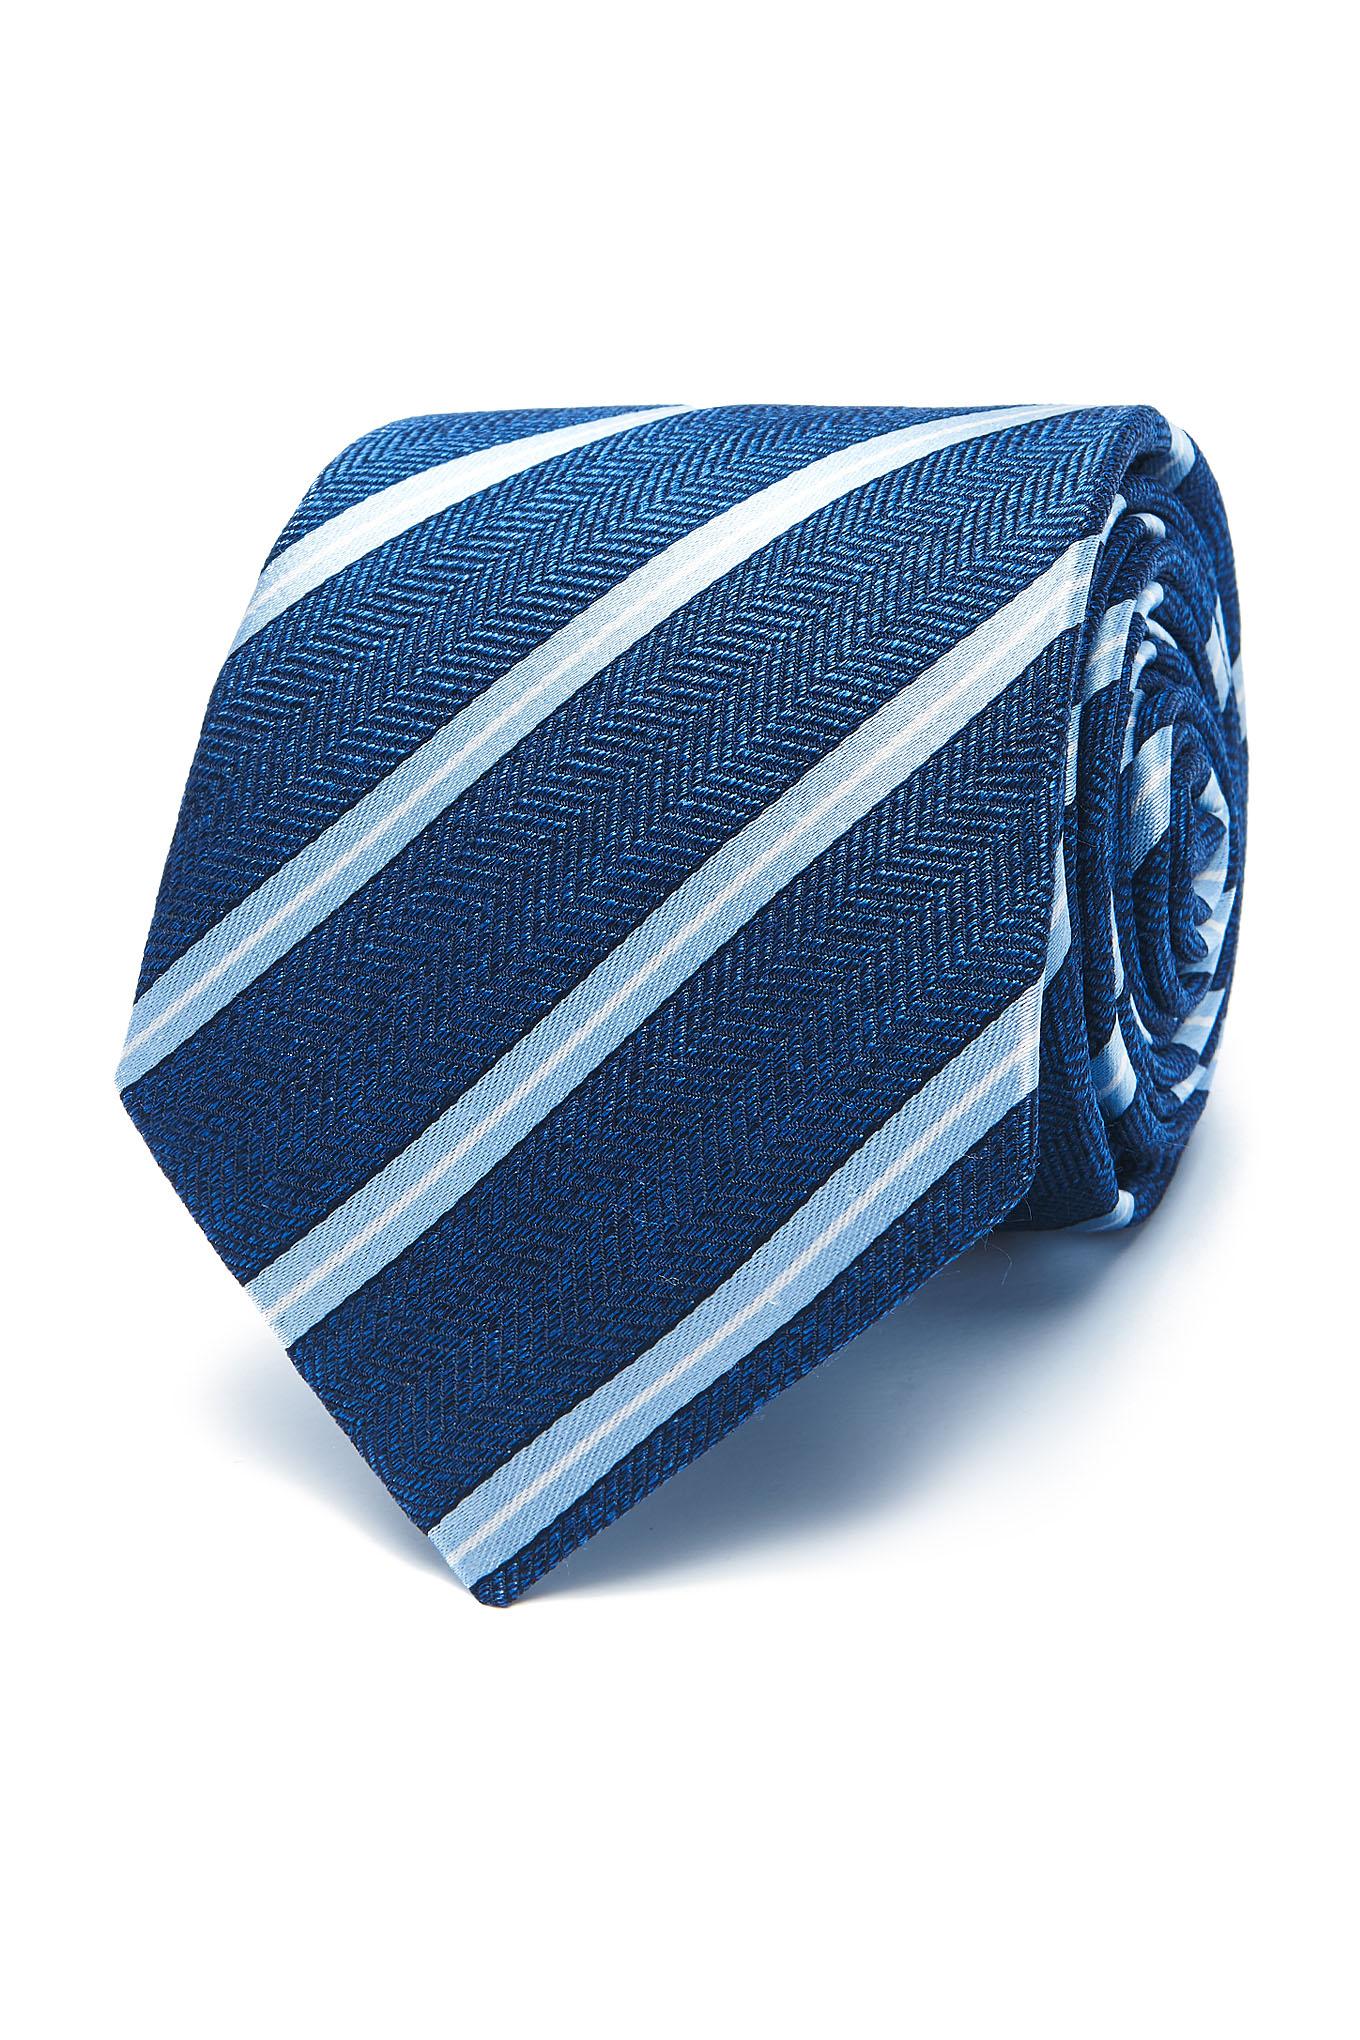 Tie Blue Classic Man